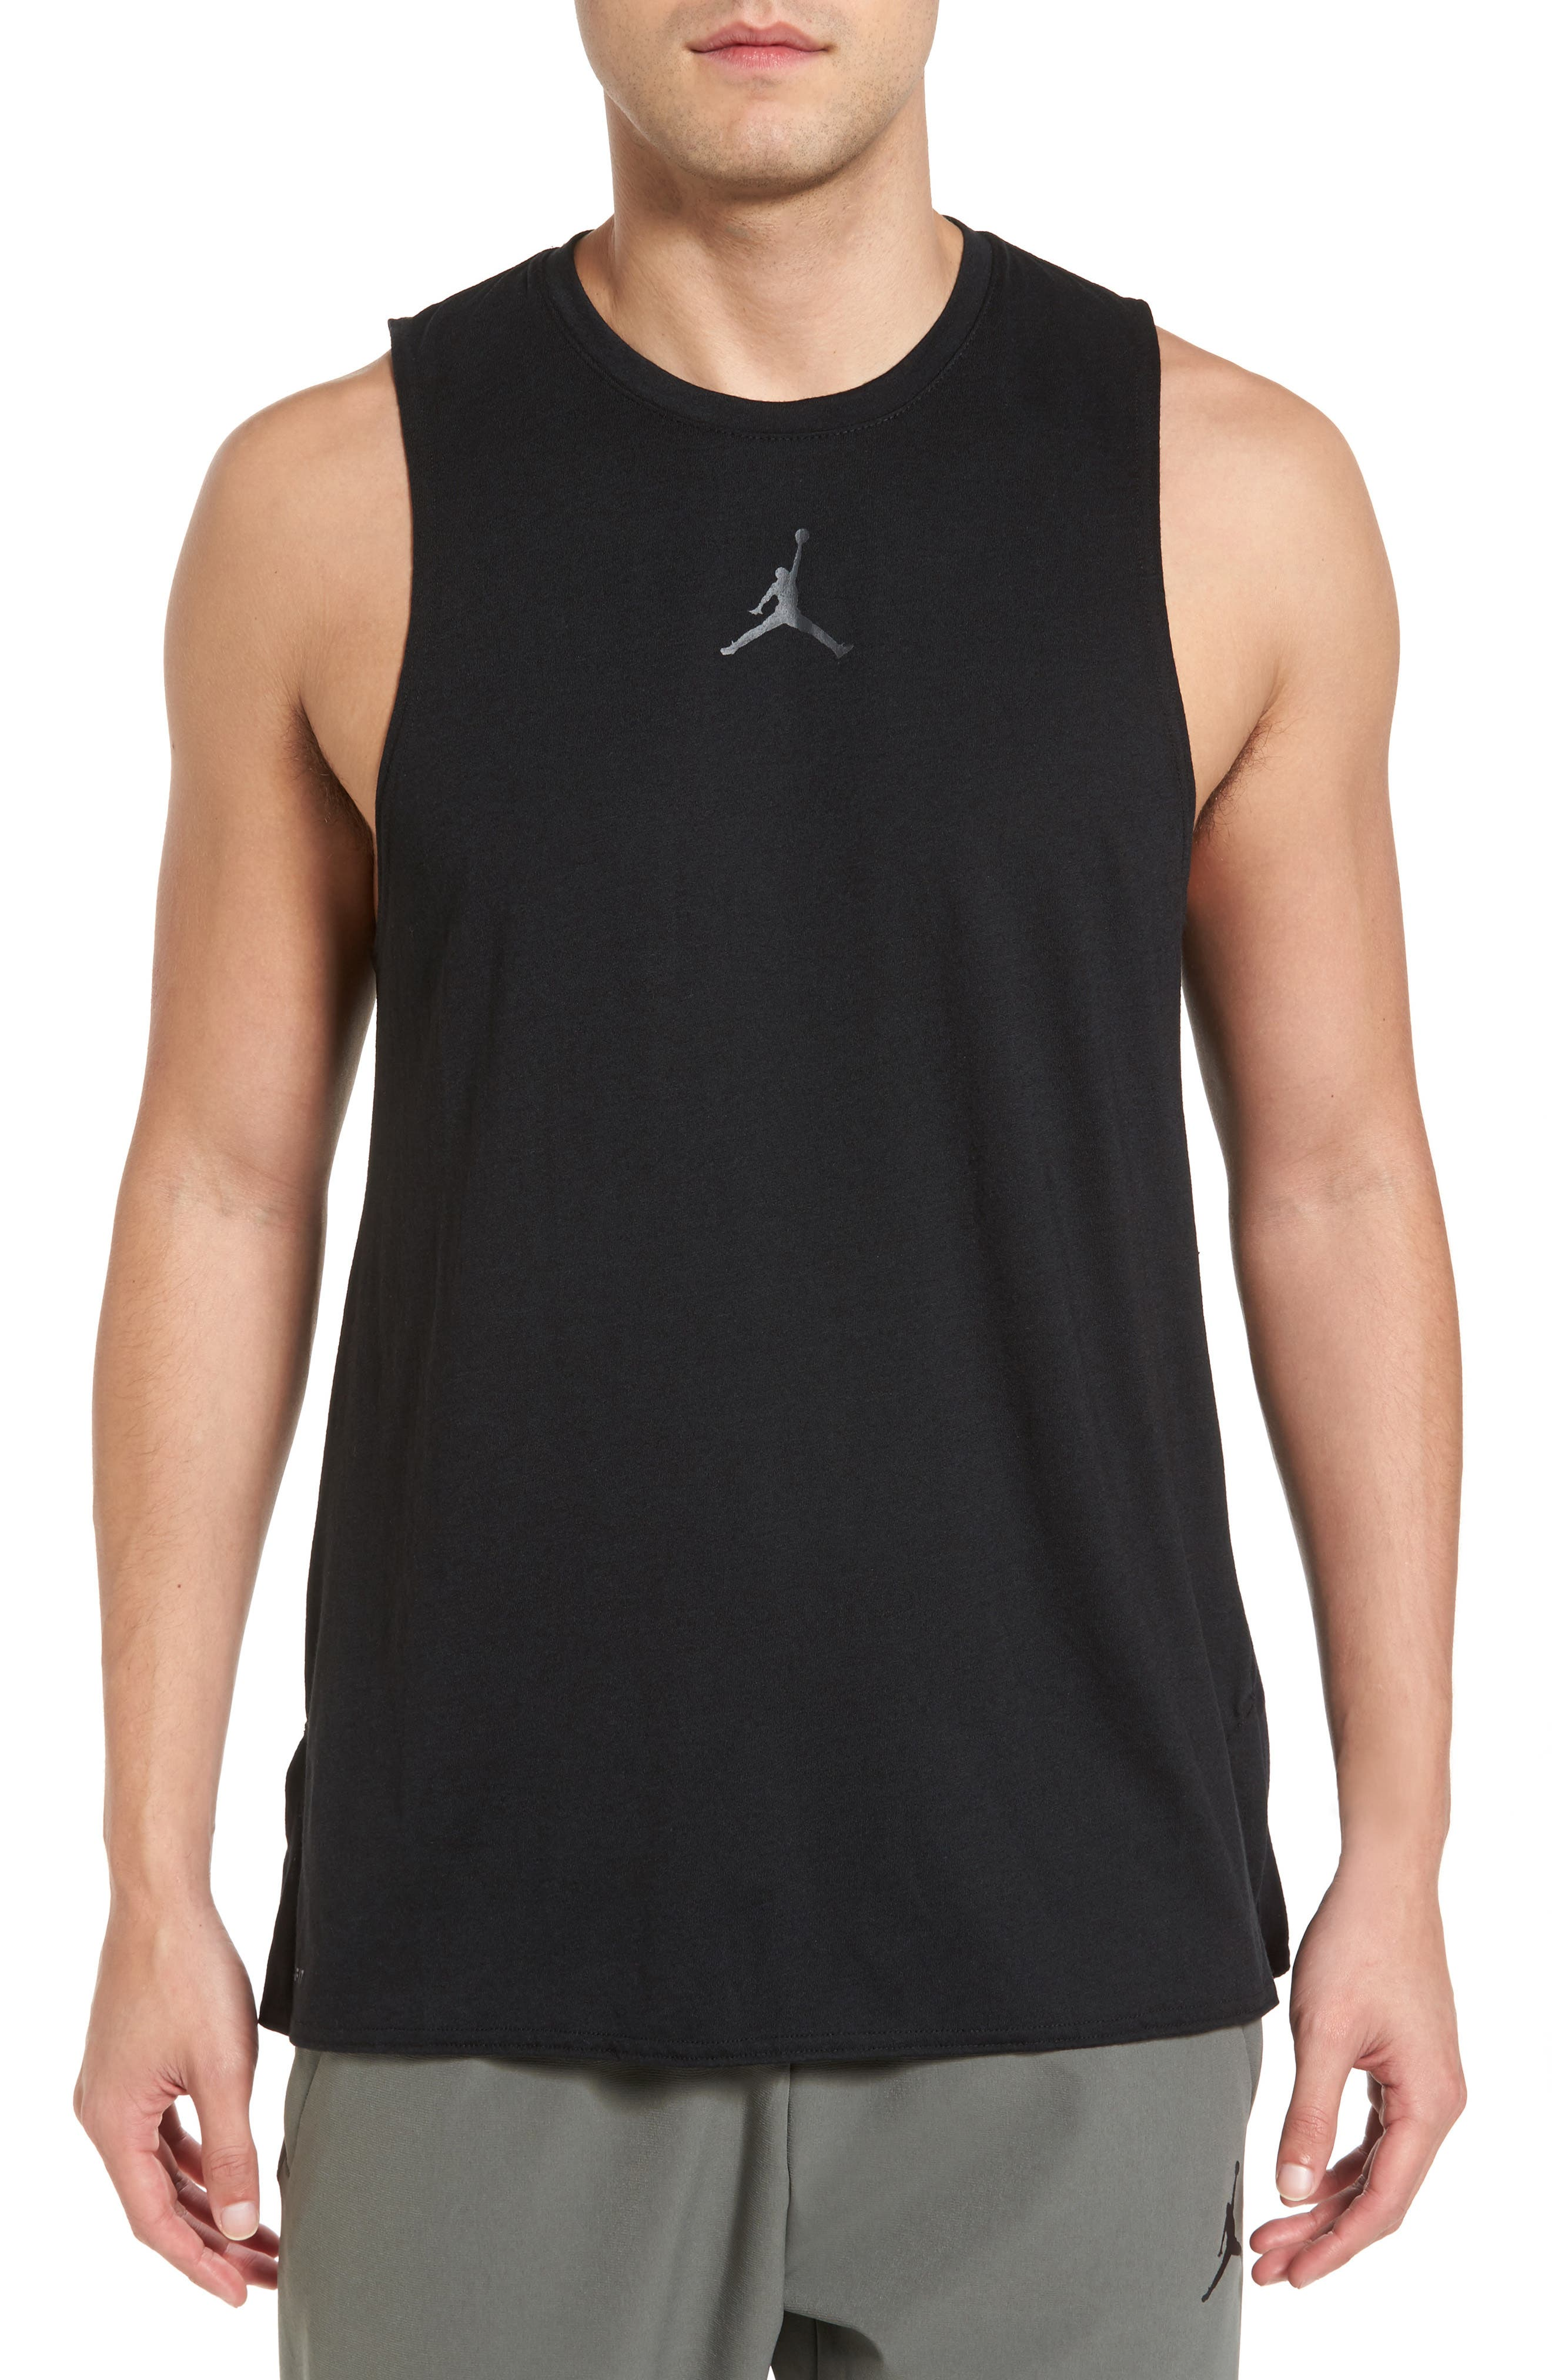 Alternate Image 1 Selected - Nike Jordan 23 Tech Tank